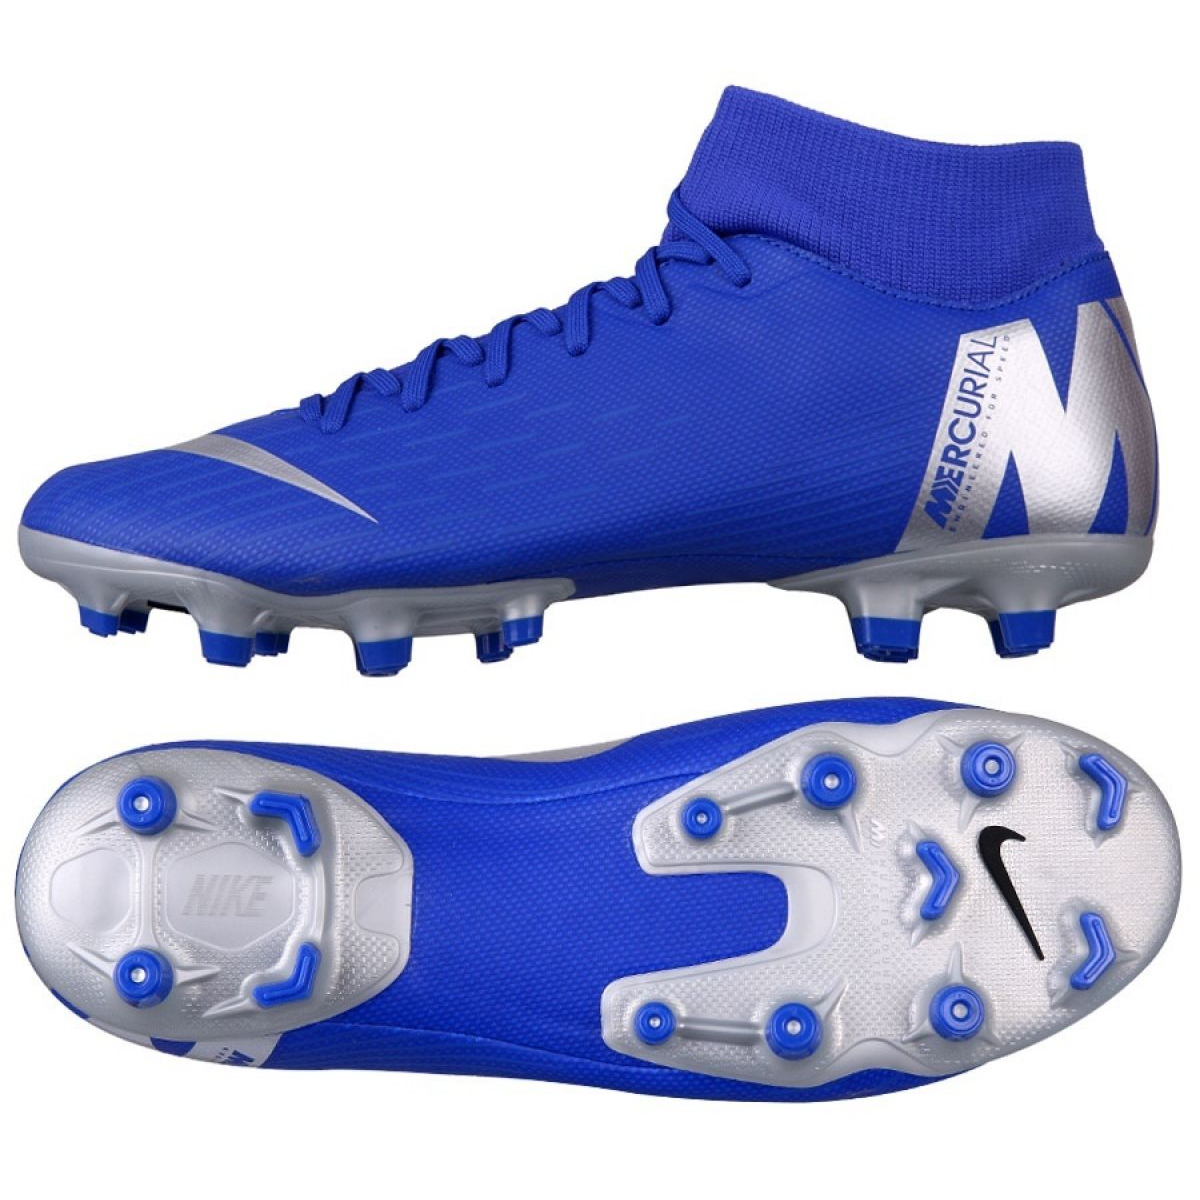 chaussure de foot 2 couleurs,chaussure de foot Nike